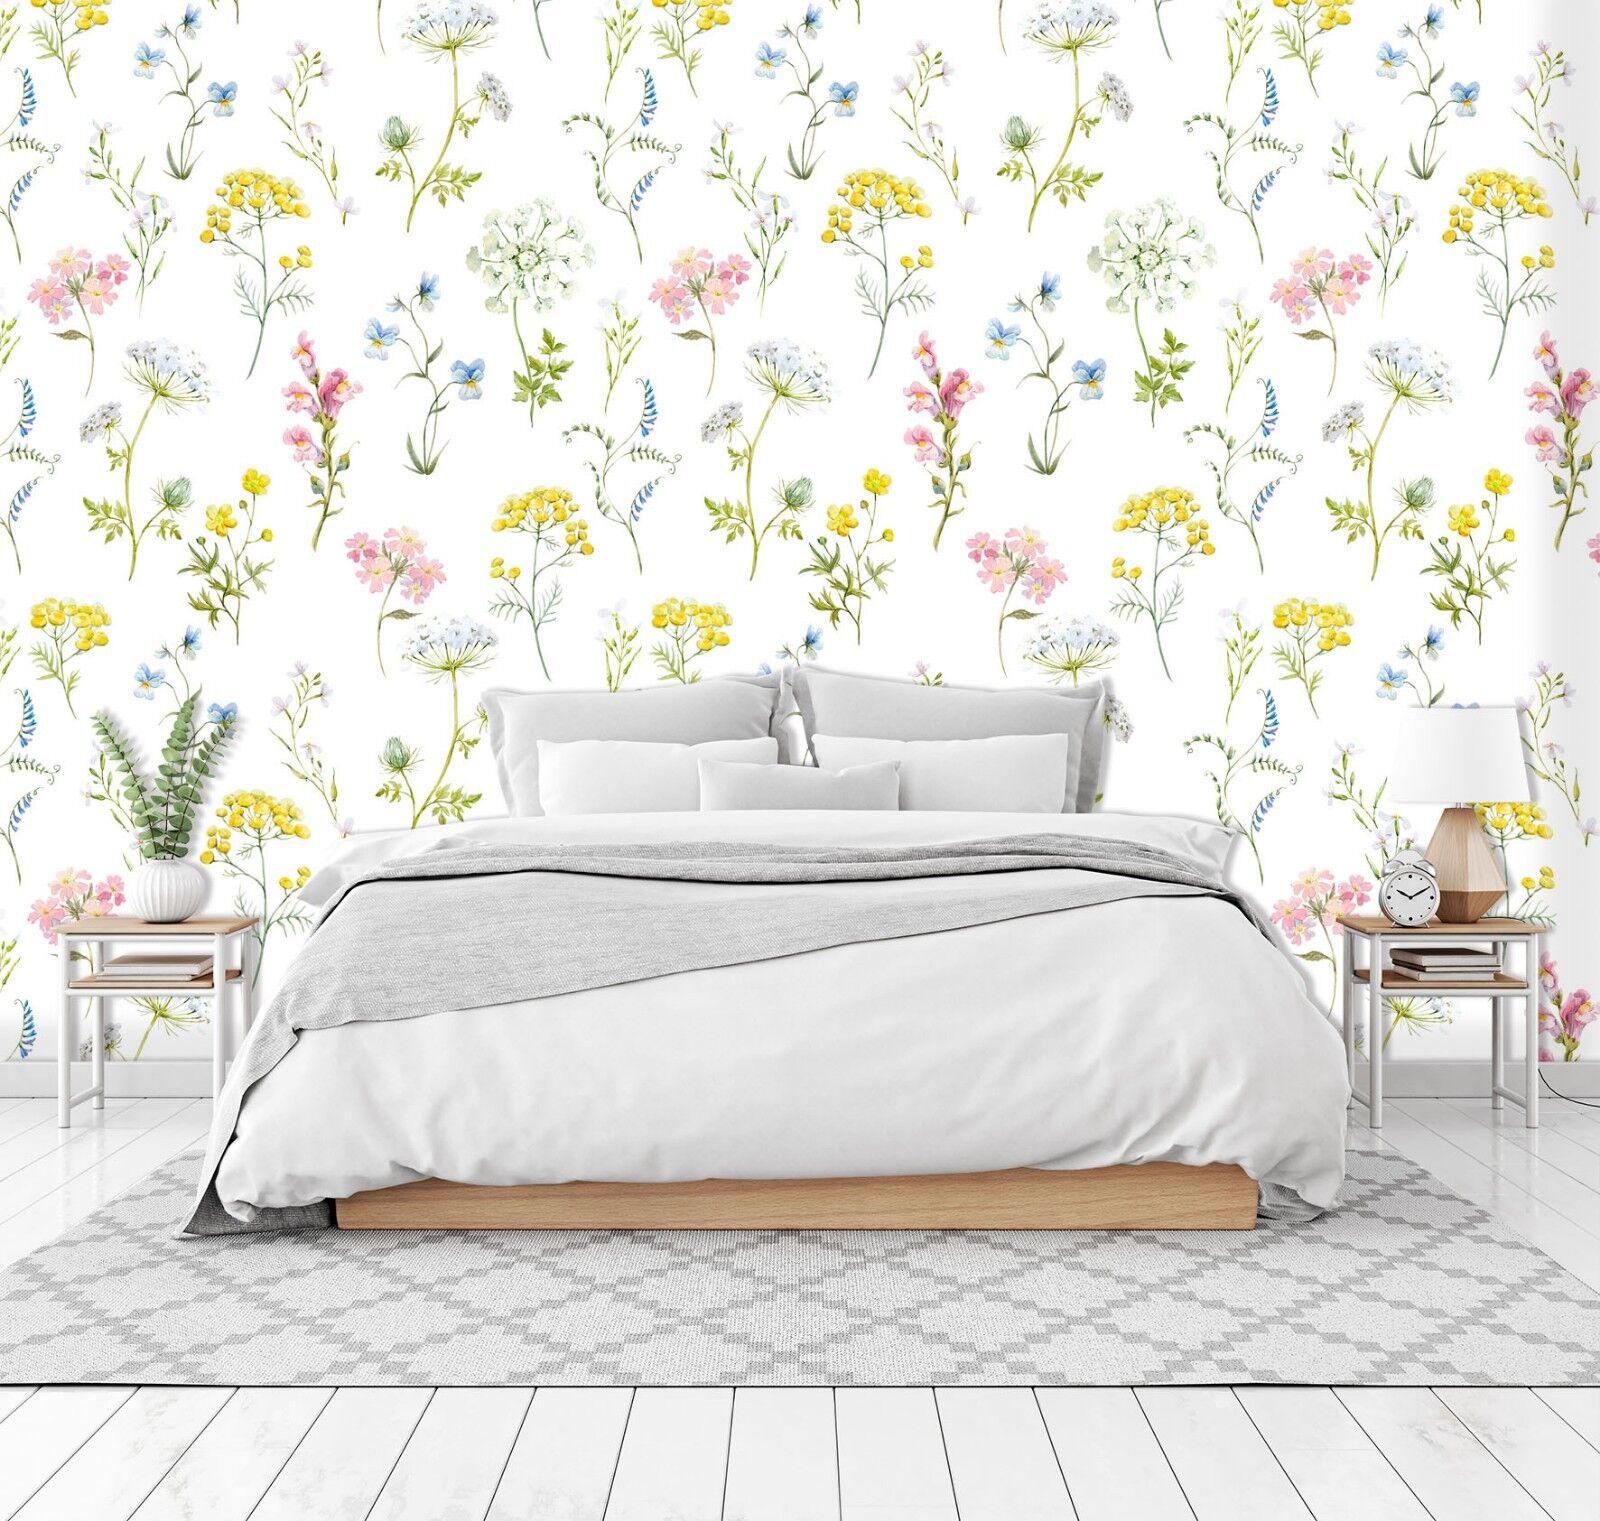 3D Pastoral Style Flowers 56 Wallpaper Murals Wall Print Wallpaper Mural AJ WALL